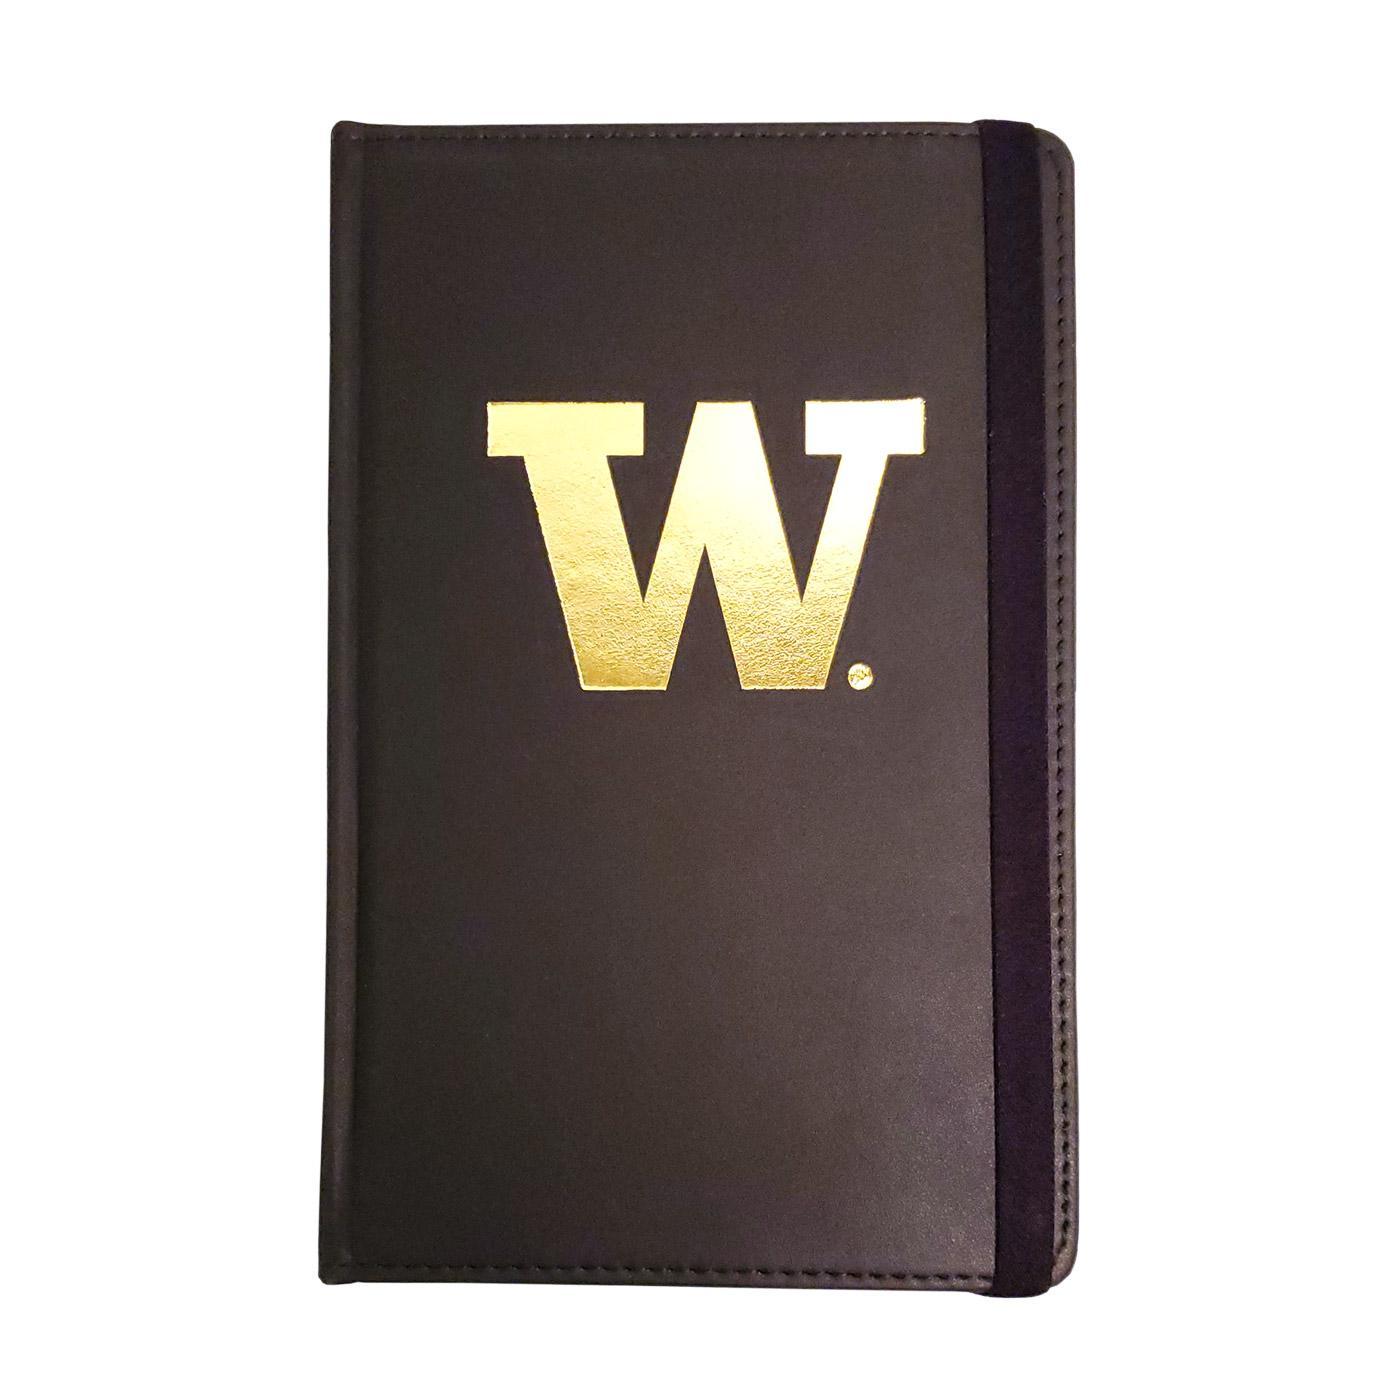 Samsill UW Ruled Journal 8.25